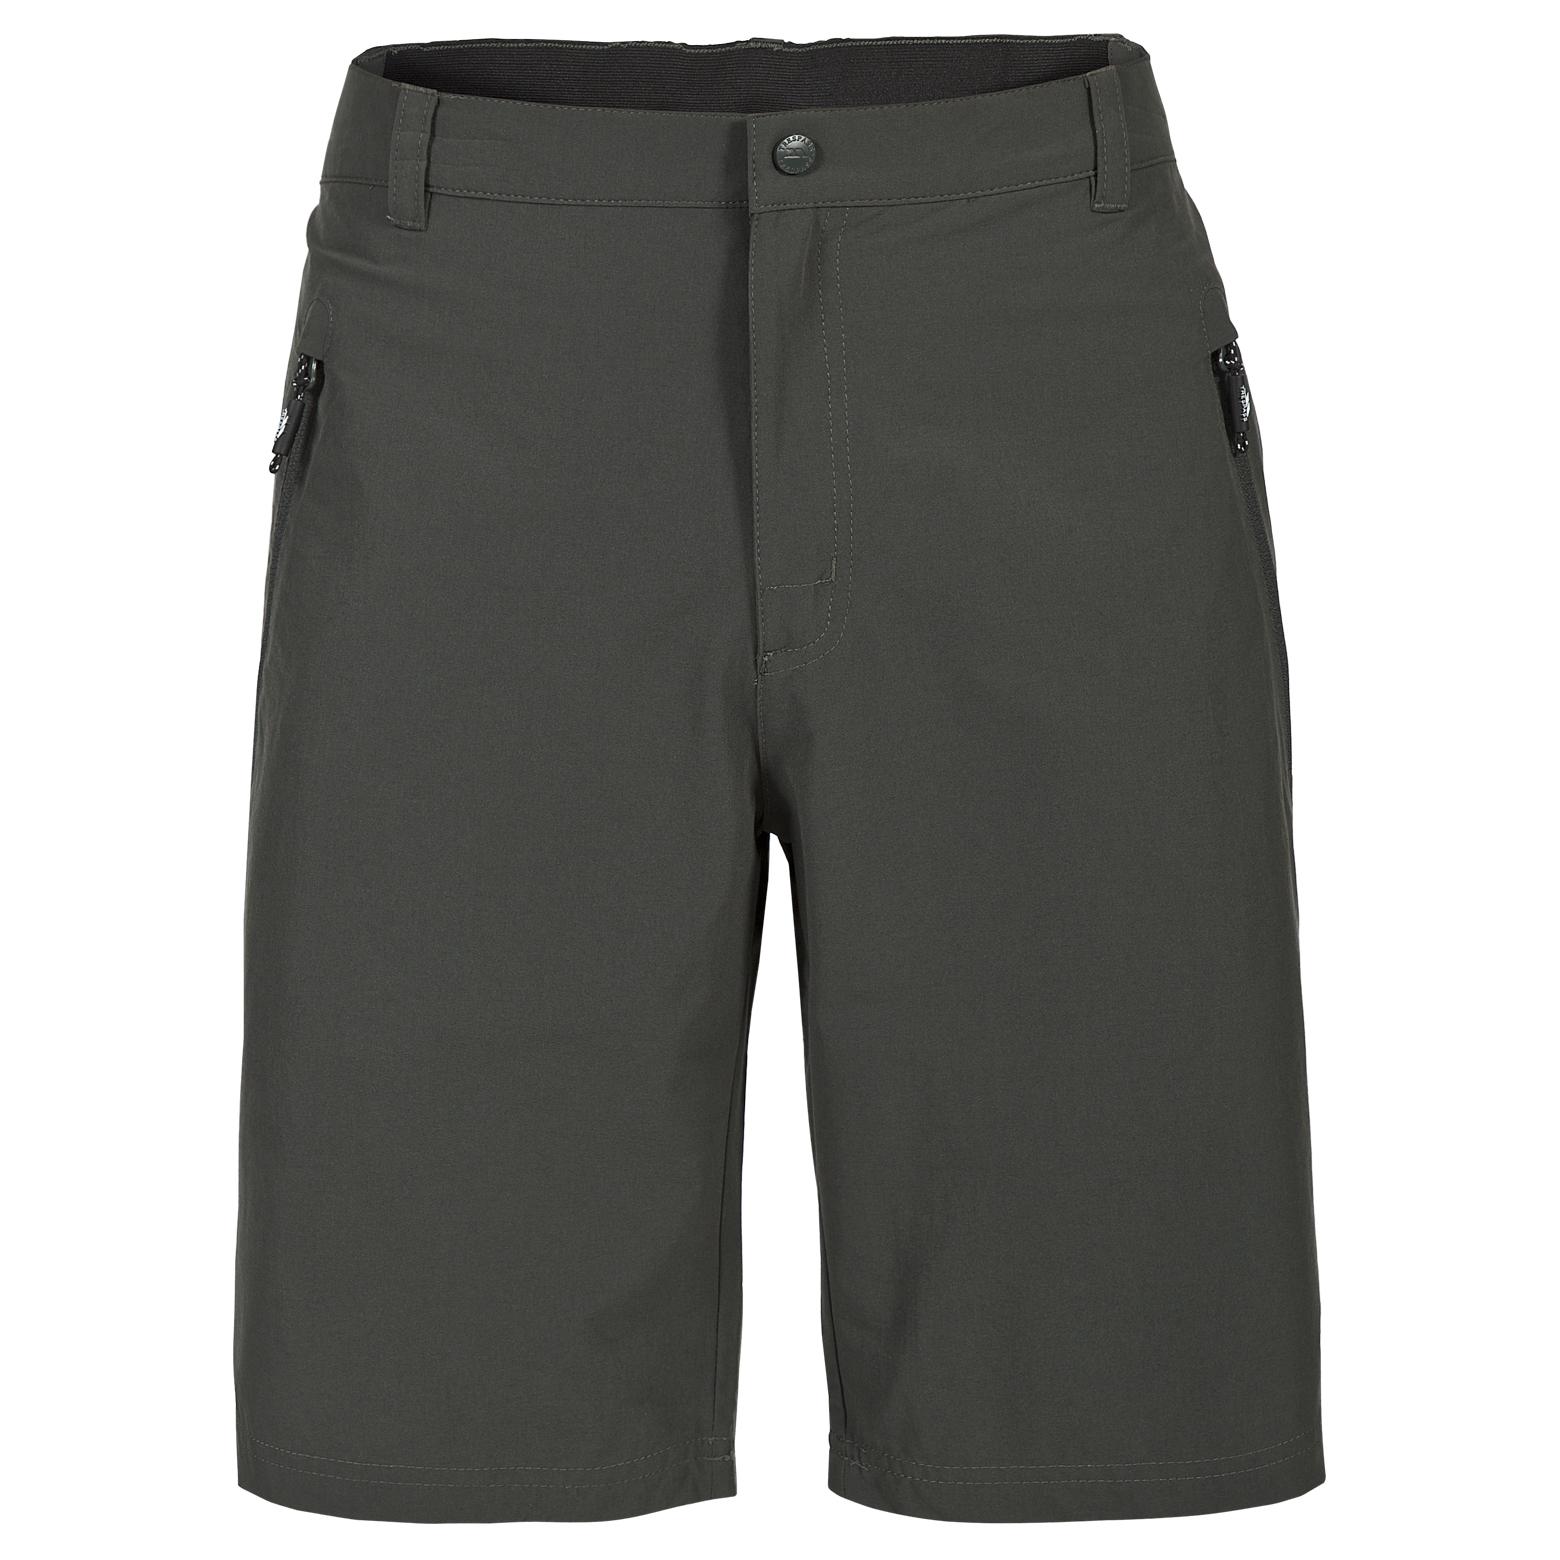 Trespass Leland Mens Hiking Shorts Walking Outdoor Summer Pants